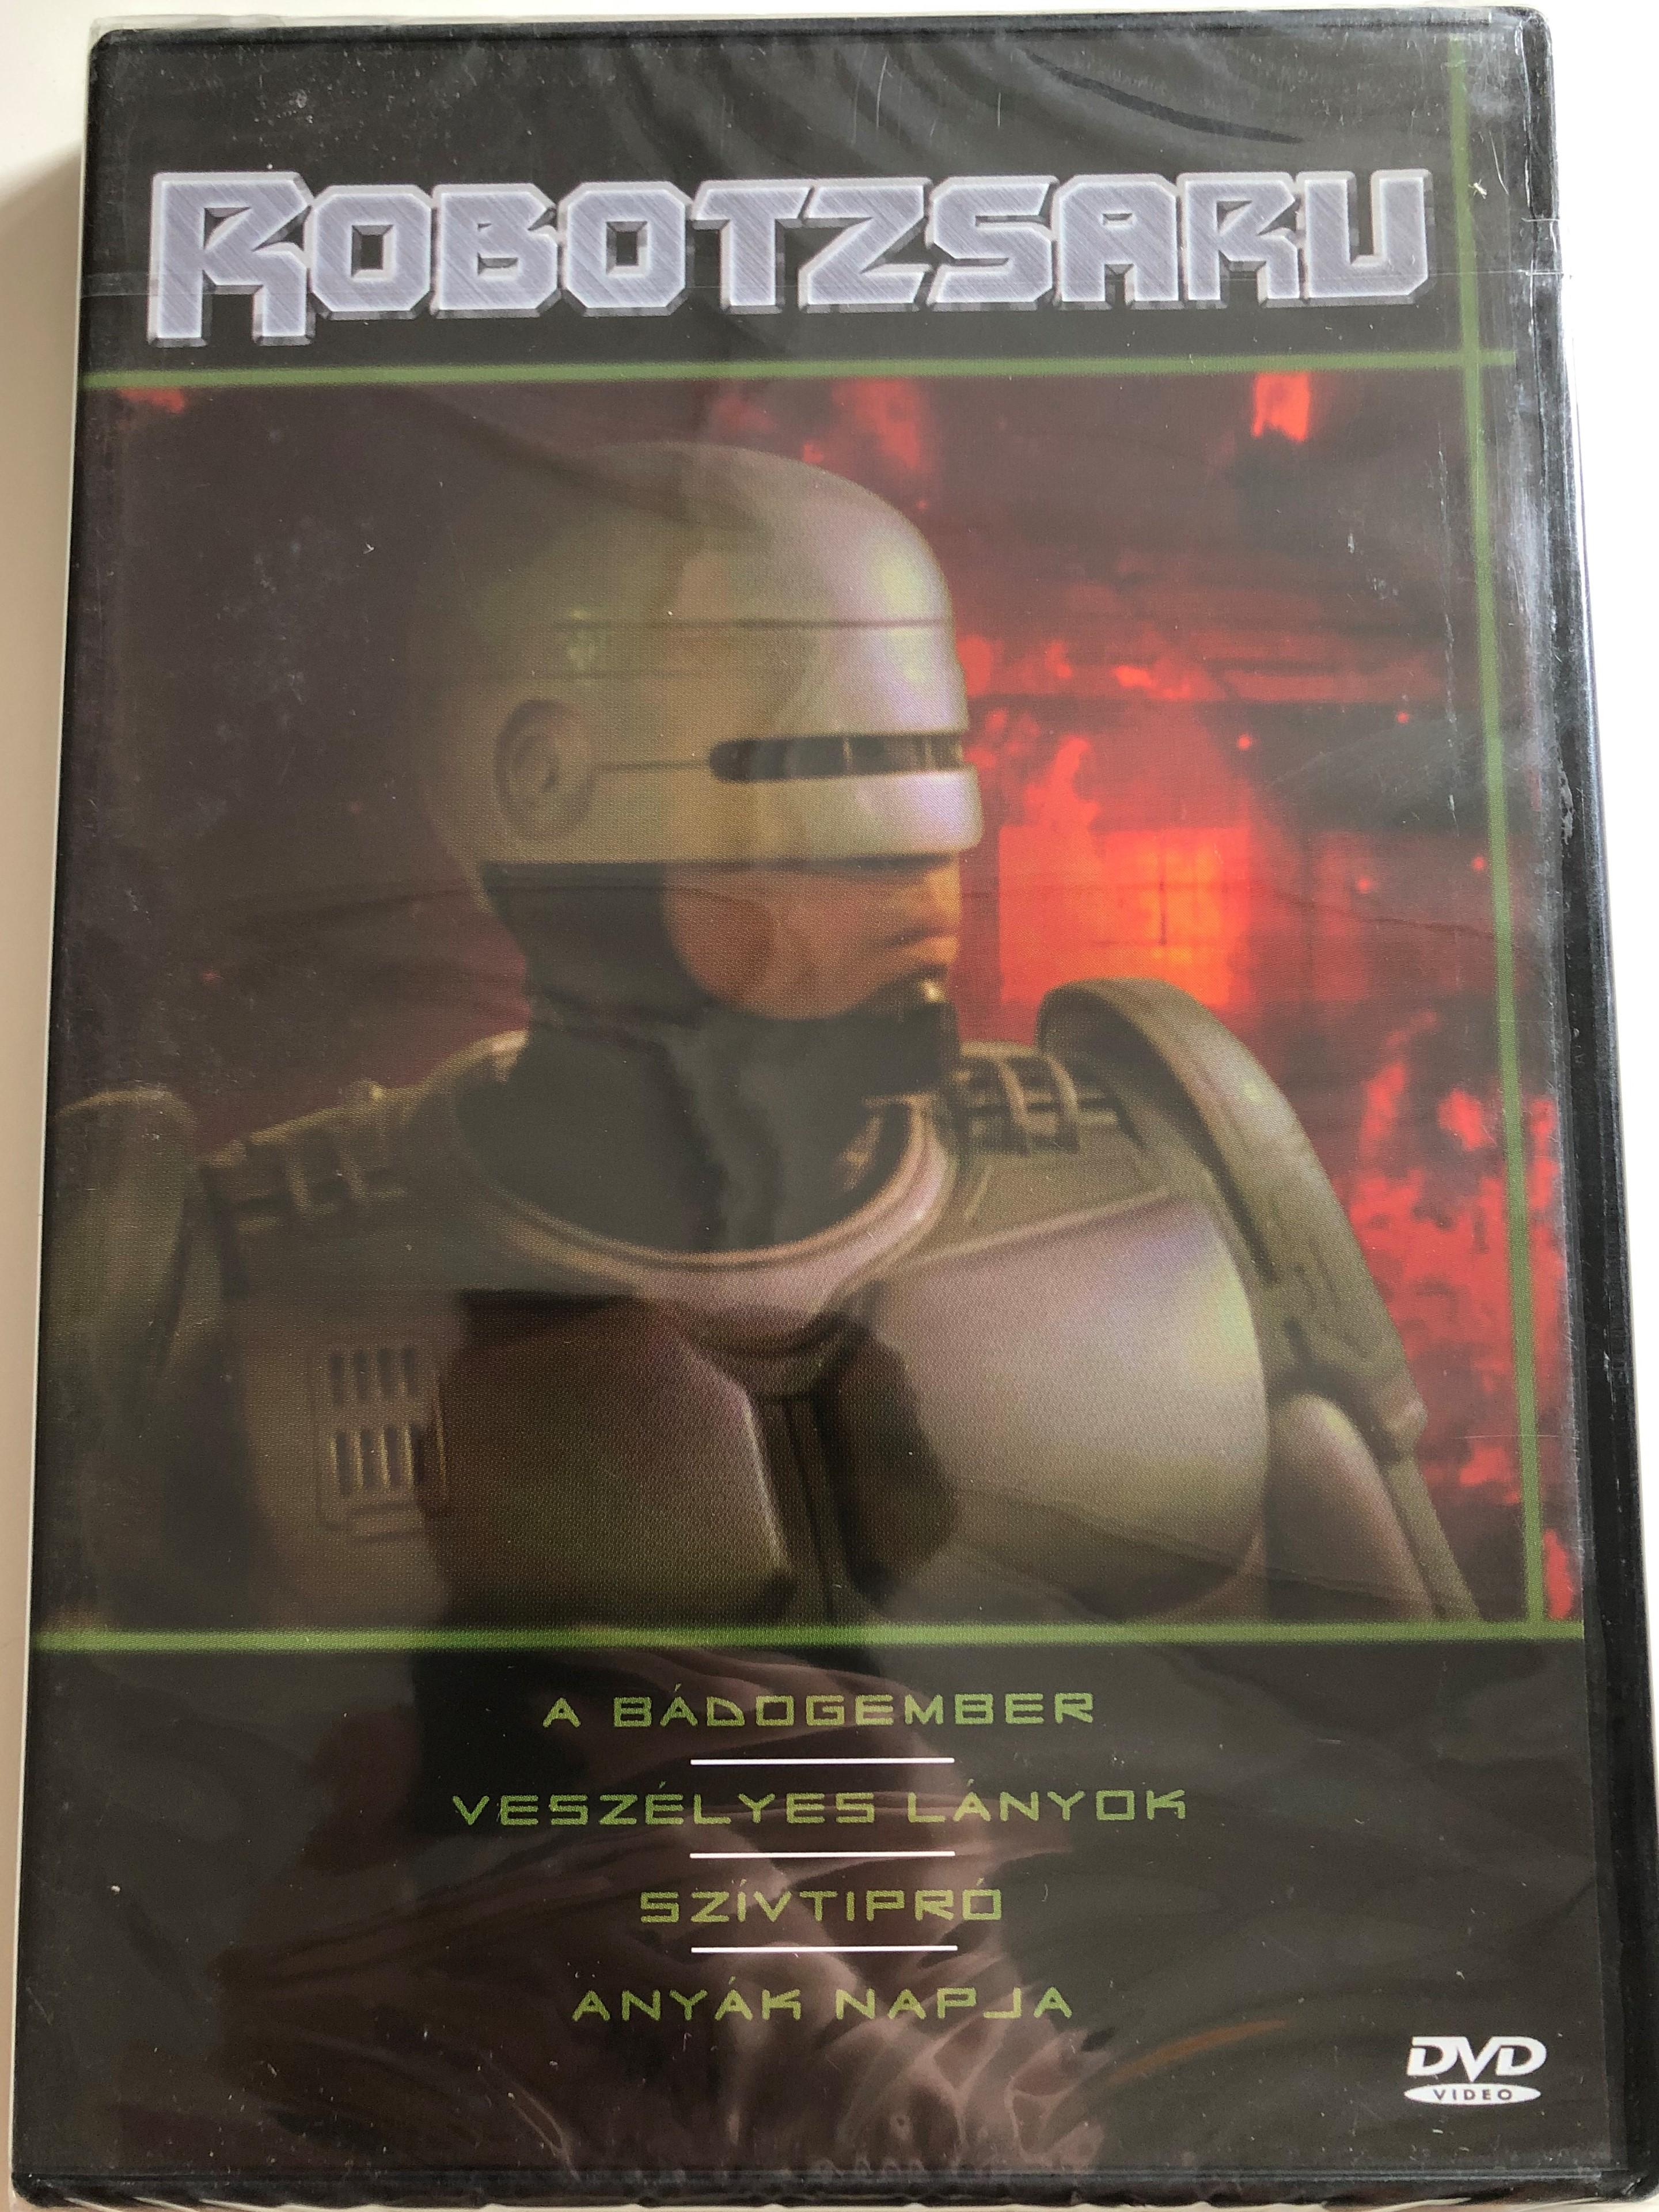 robocop-dvd-1994-robotzsaru-tv-series-created-by-michael-miner-edward-neumeier-starring-richard-eden-yvette-nipar-disc-5-4-episodes-1-.jpg